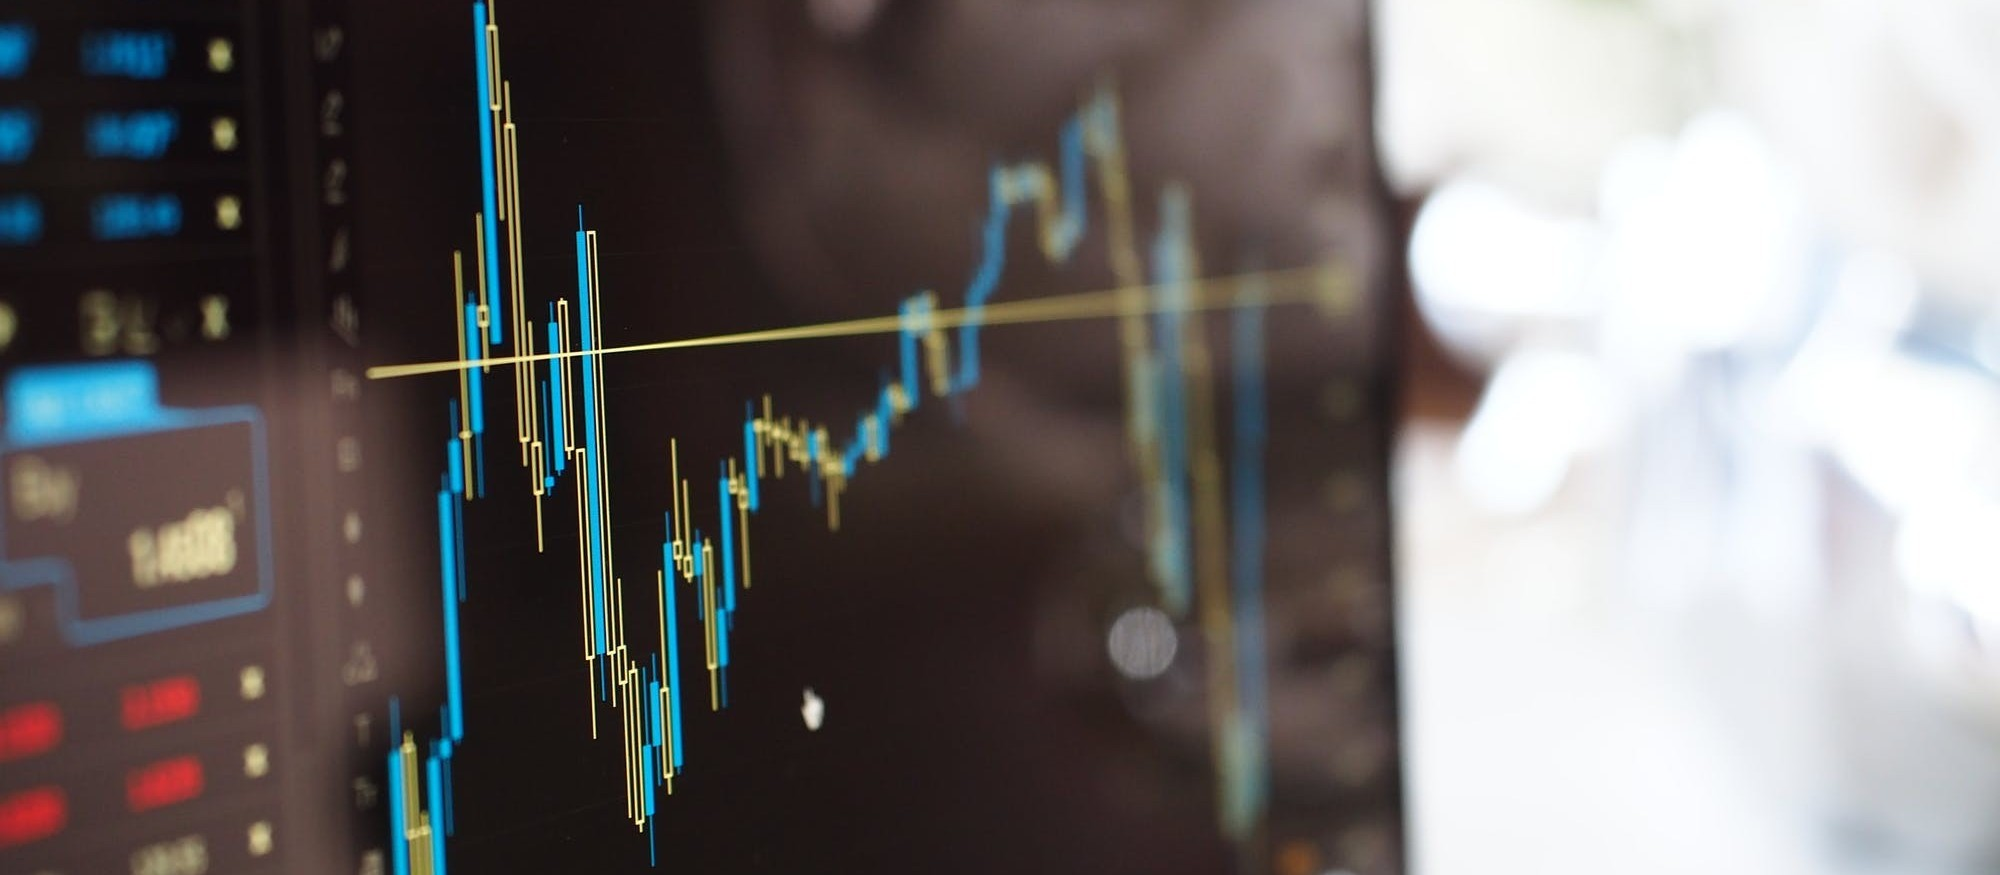 O que pensar da bolsa de valores no atual momento?